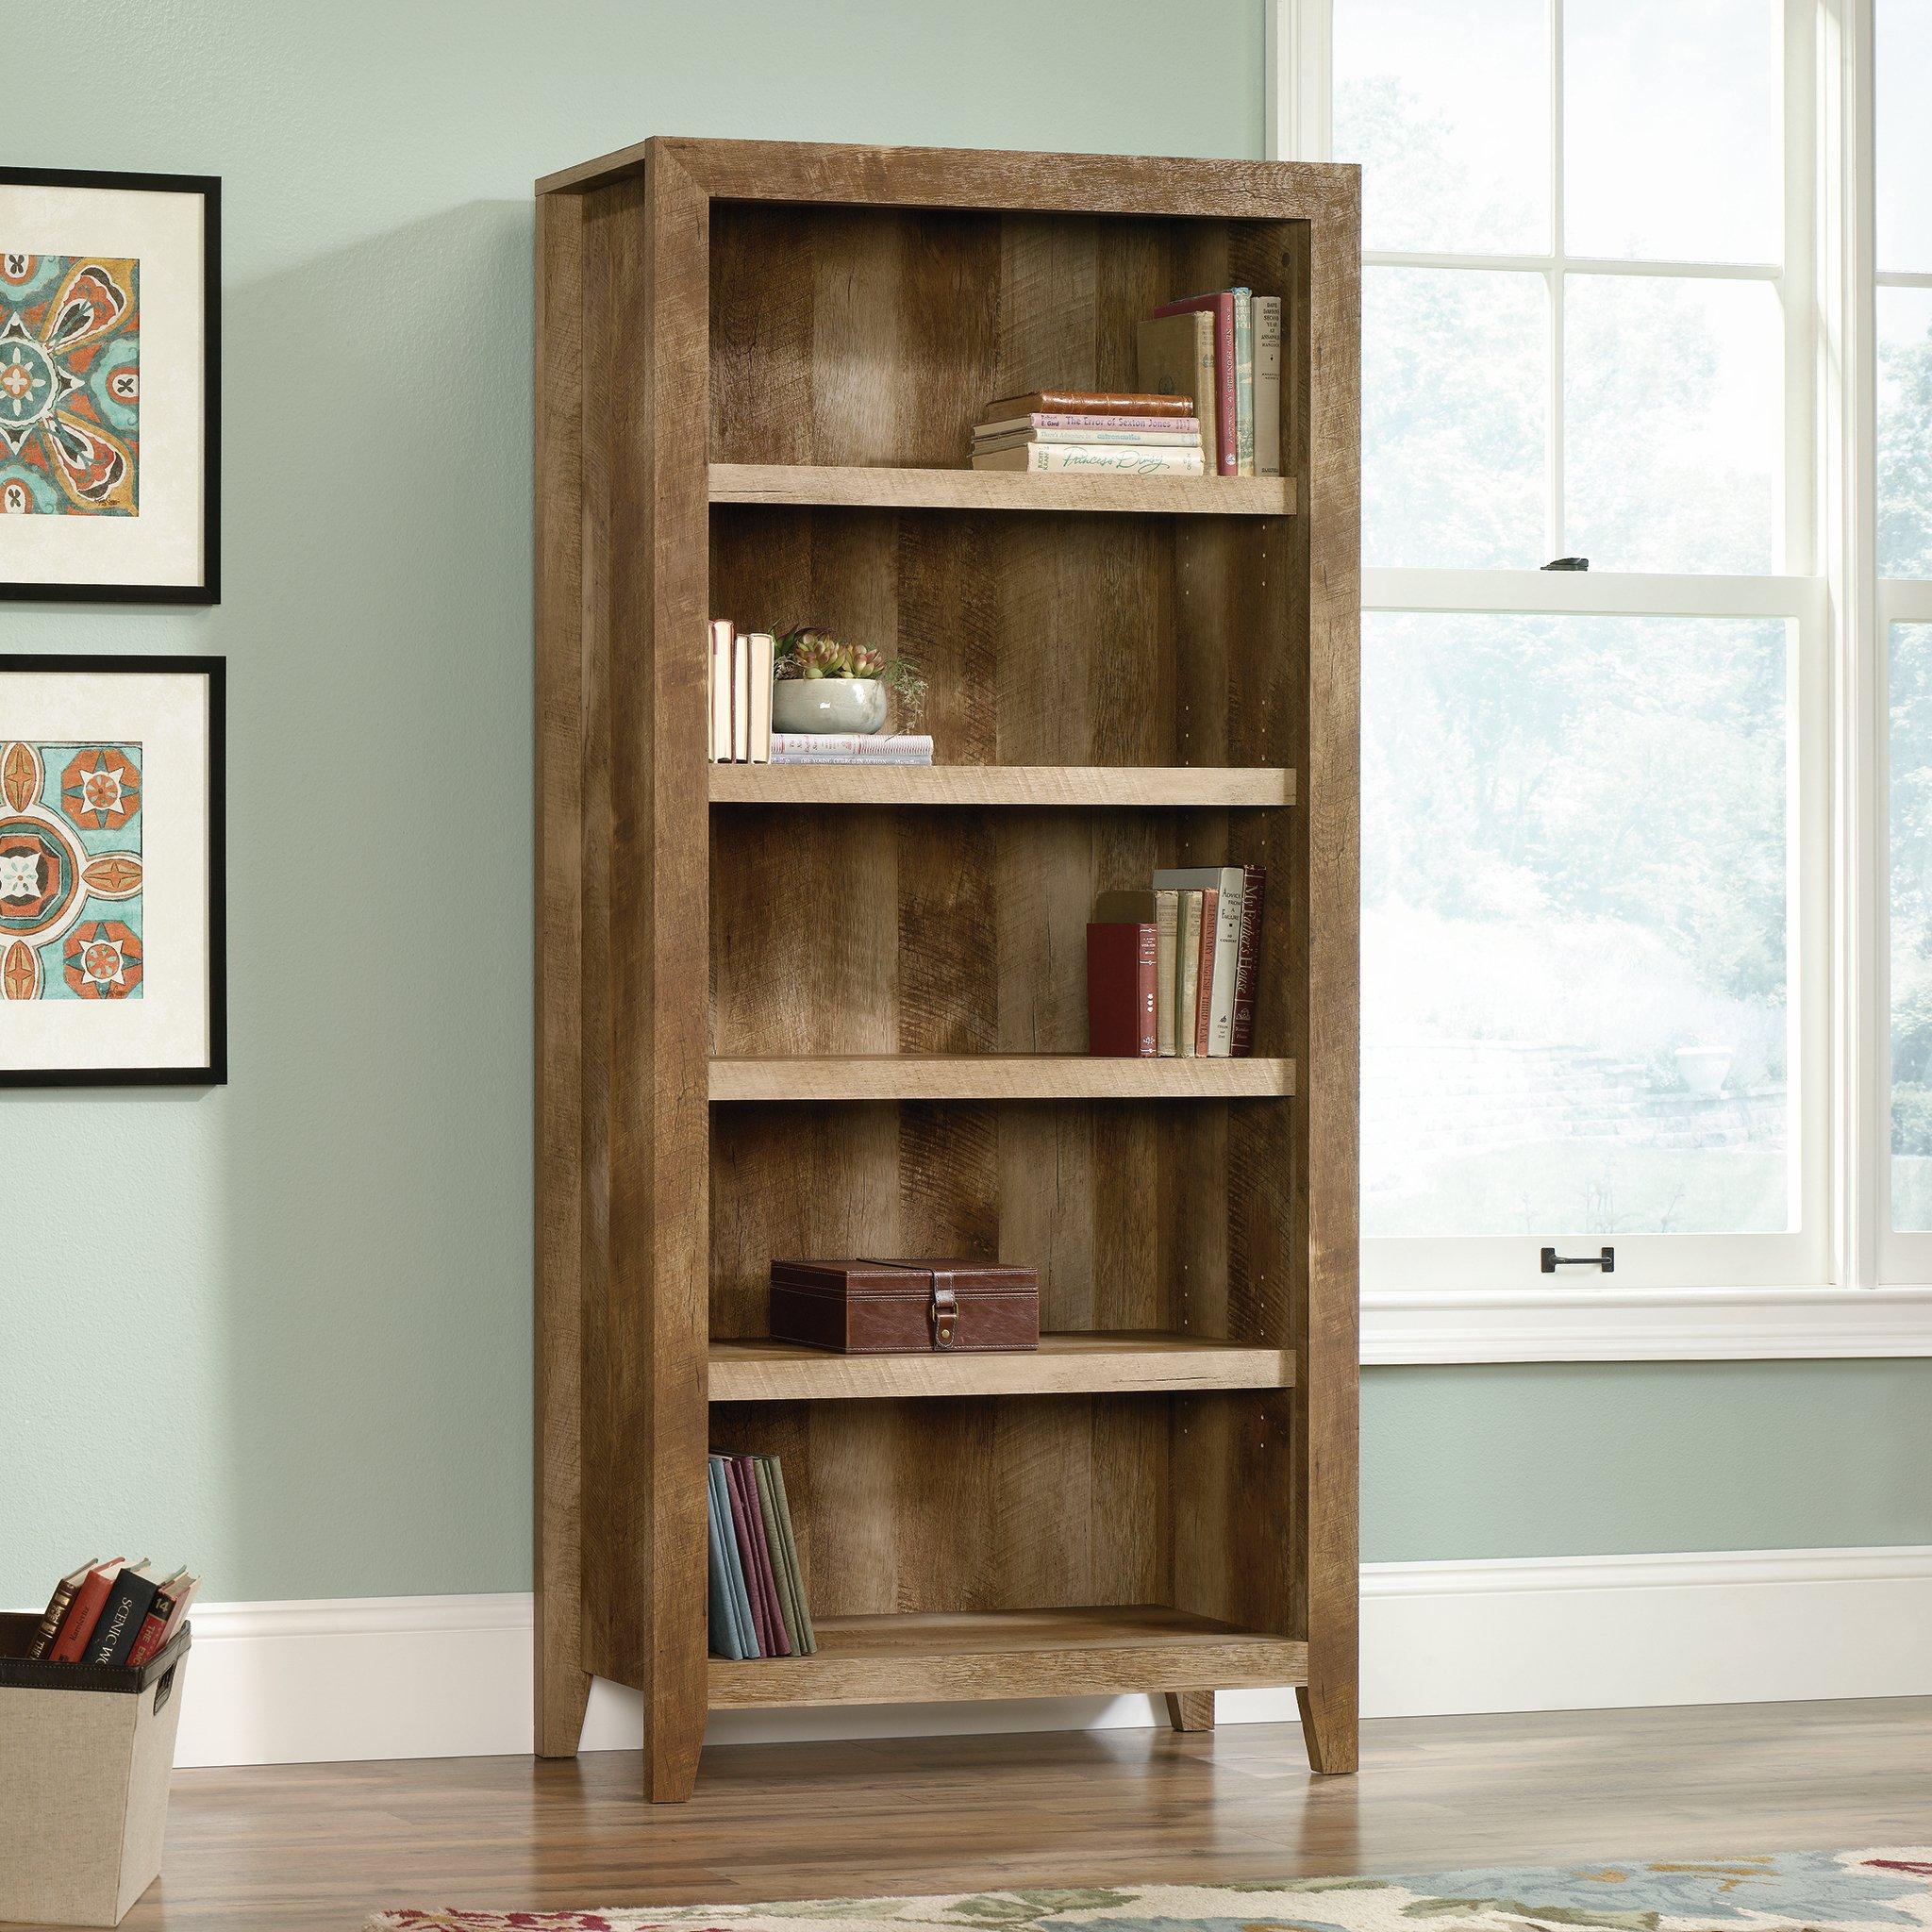 Sauder 418546 Dakota Pass 5-Shelf Bookcase, L: 33.78'' x W: 12.52'' x H: 71.1, Craftsman Oak finish by Sauder (Image #4)